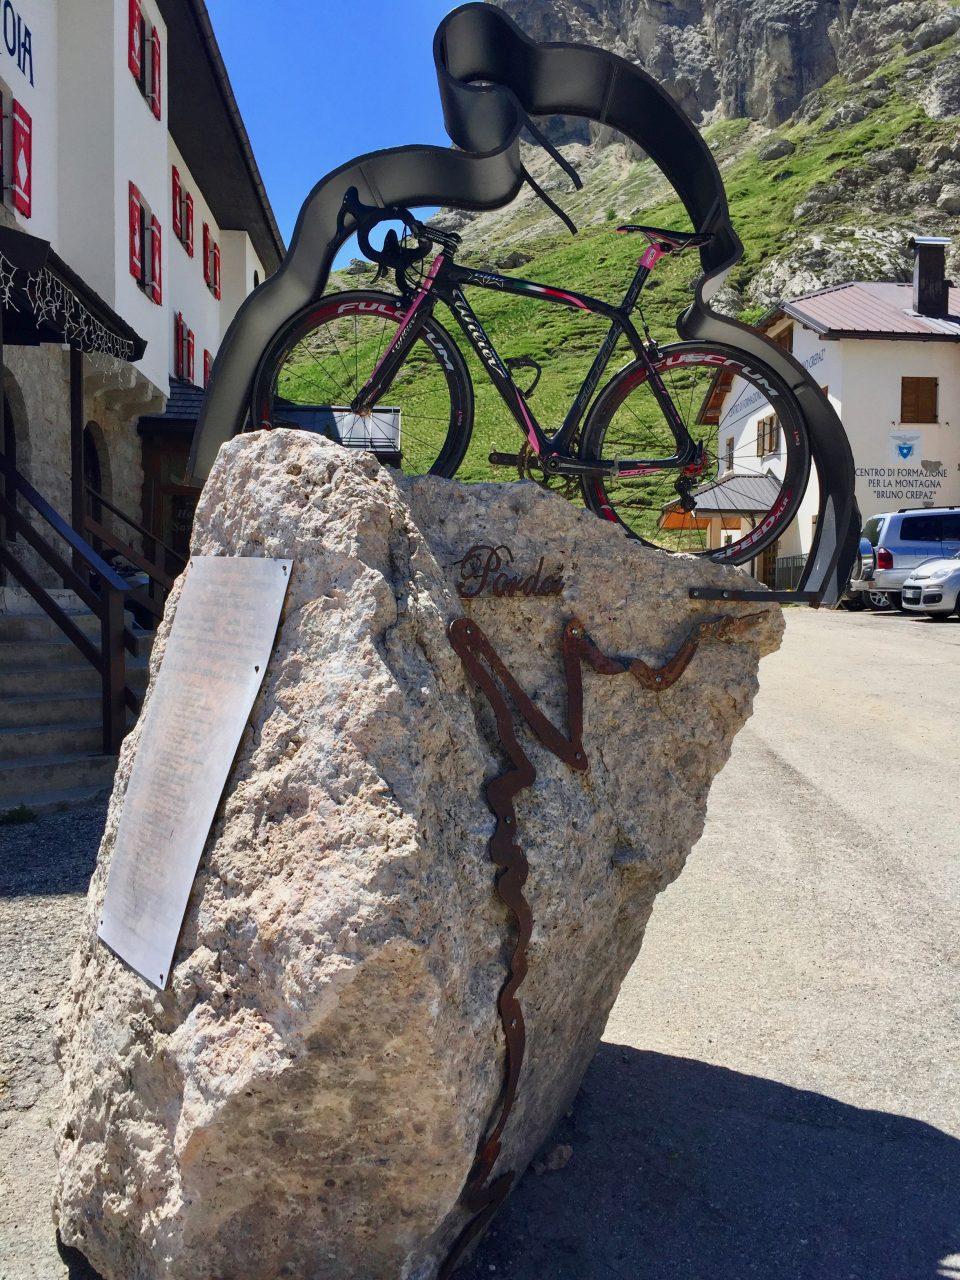 Originalrad Gilberto Simoni, Passo Pordoi, Dolomites, Italy